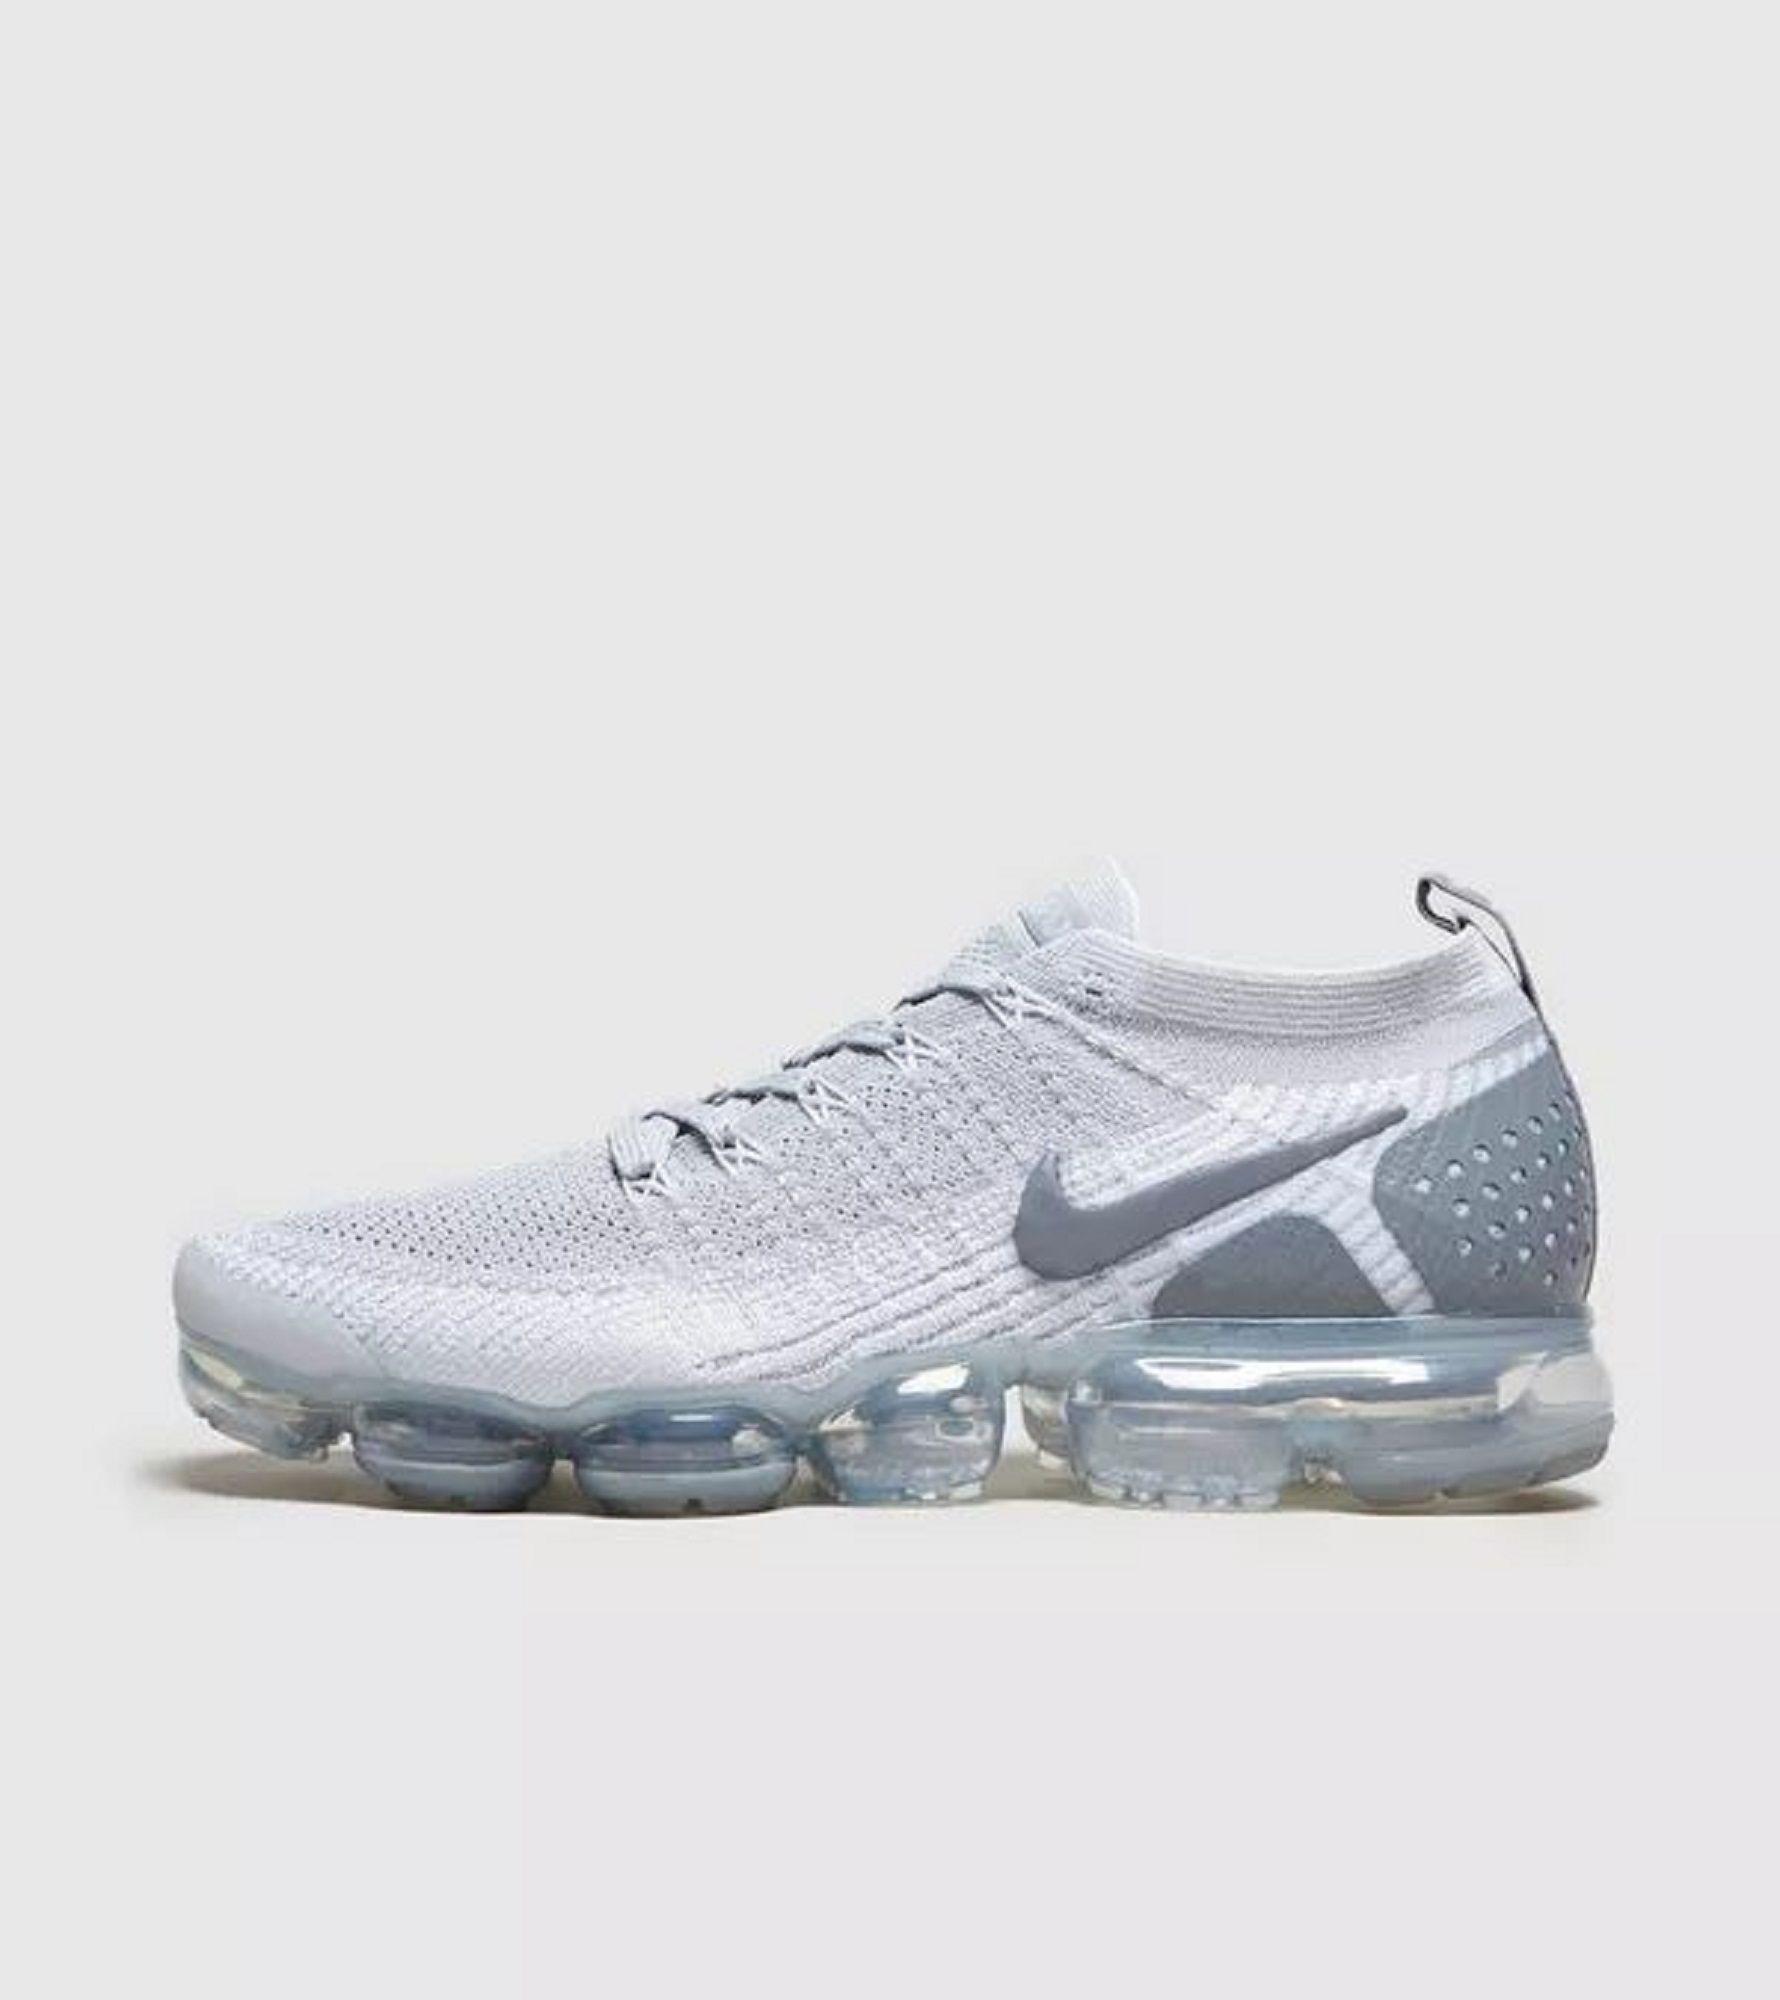 a0a7efbcb58a0 Nike vapormax flyknit 2 wolf grey pure platinum AV7973-001 | Shoes ...